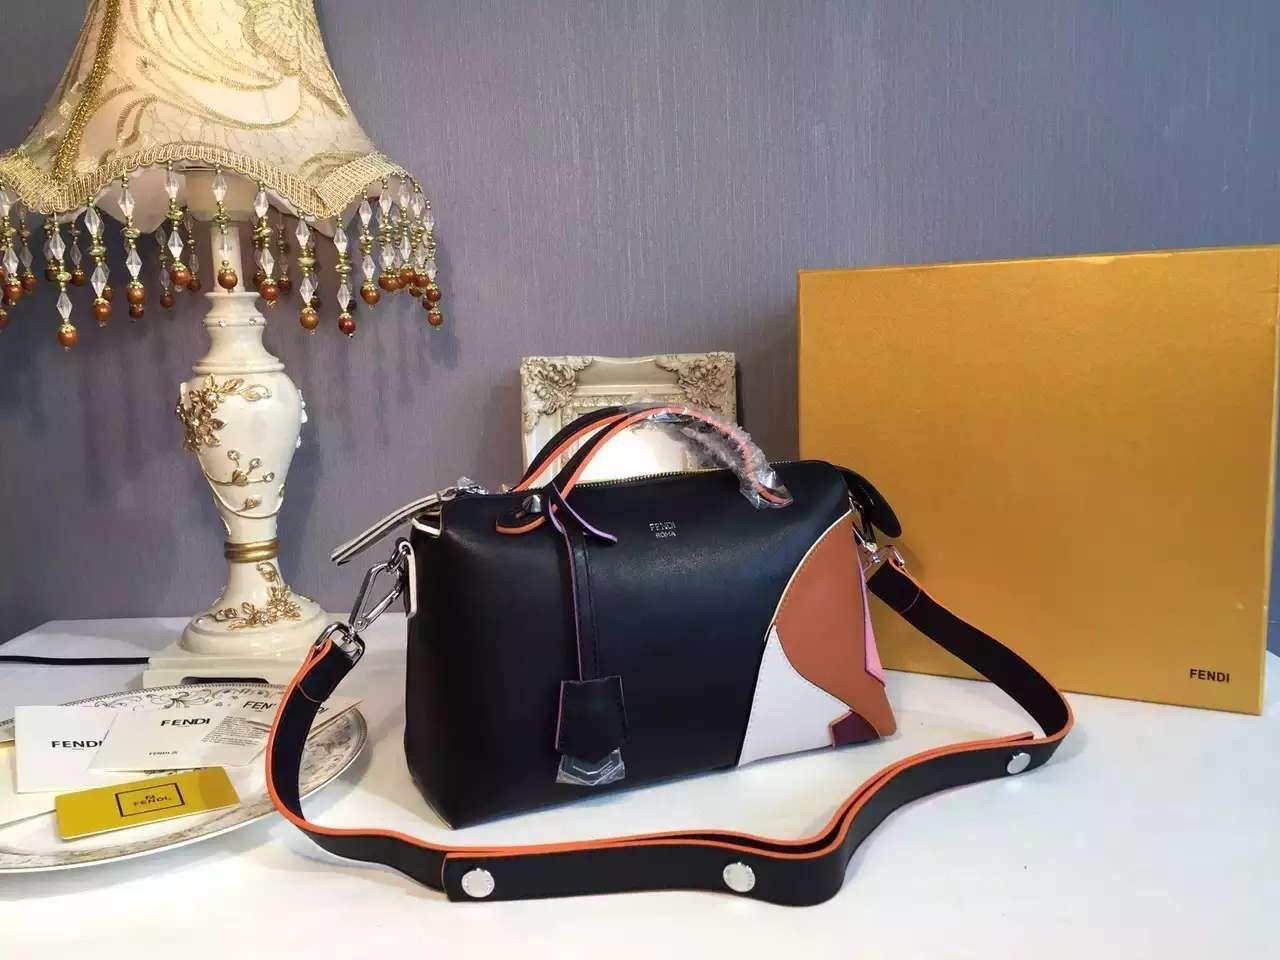 d036ce4ca12d ... where to buy fendi bag id 50449forsaleayybags green fendi bag fendi  0a273 5406a ...